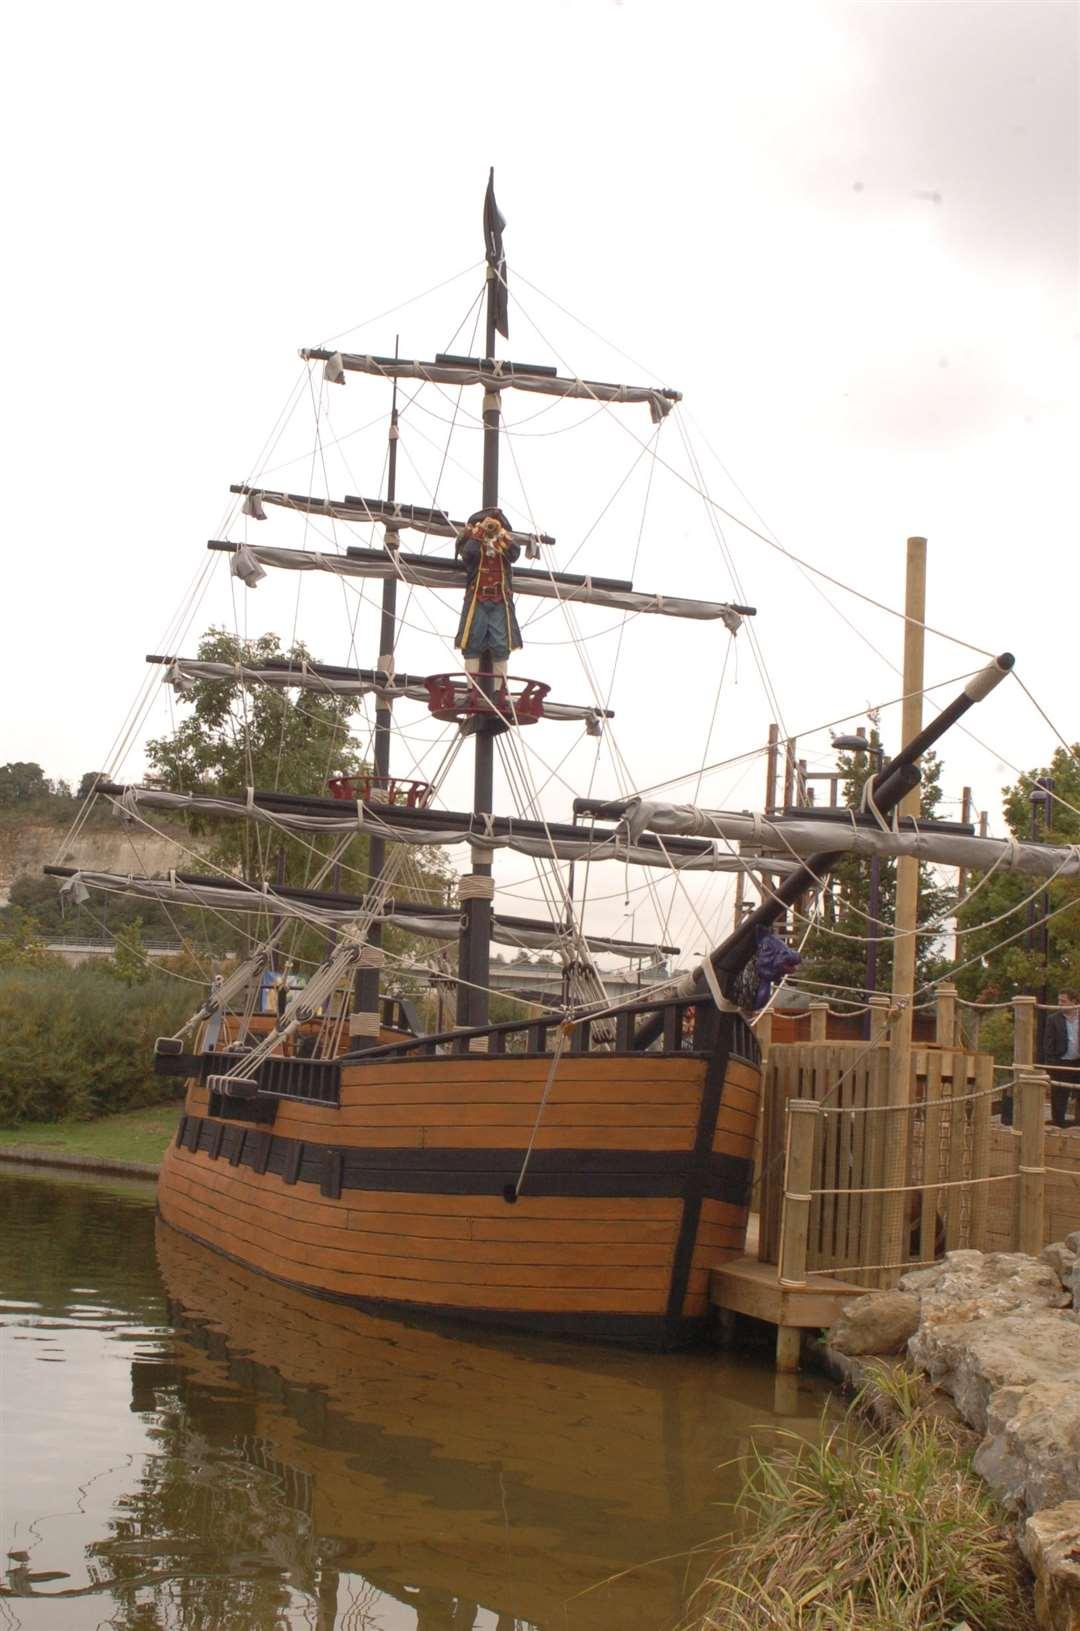 Pirate Cove Adventure Park, Bluewater. Picture: Steve Crispe